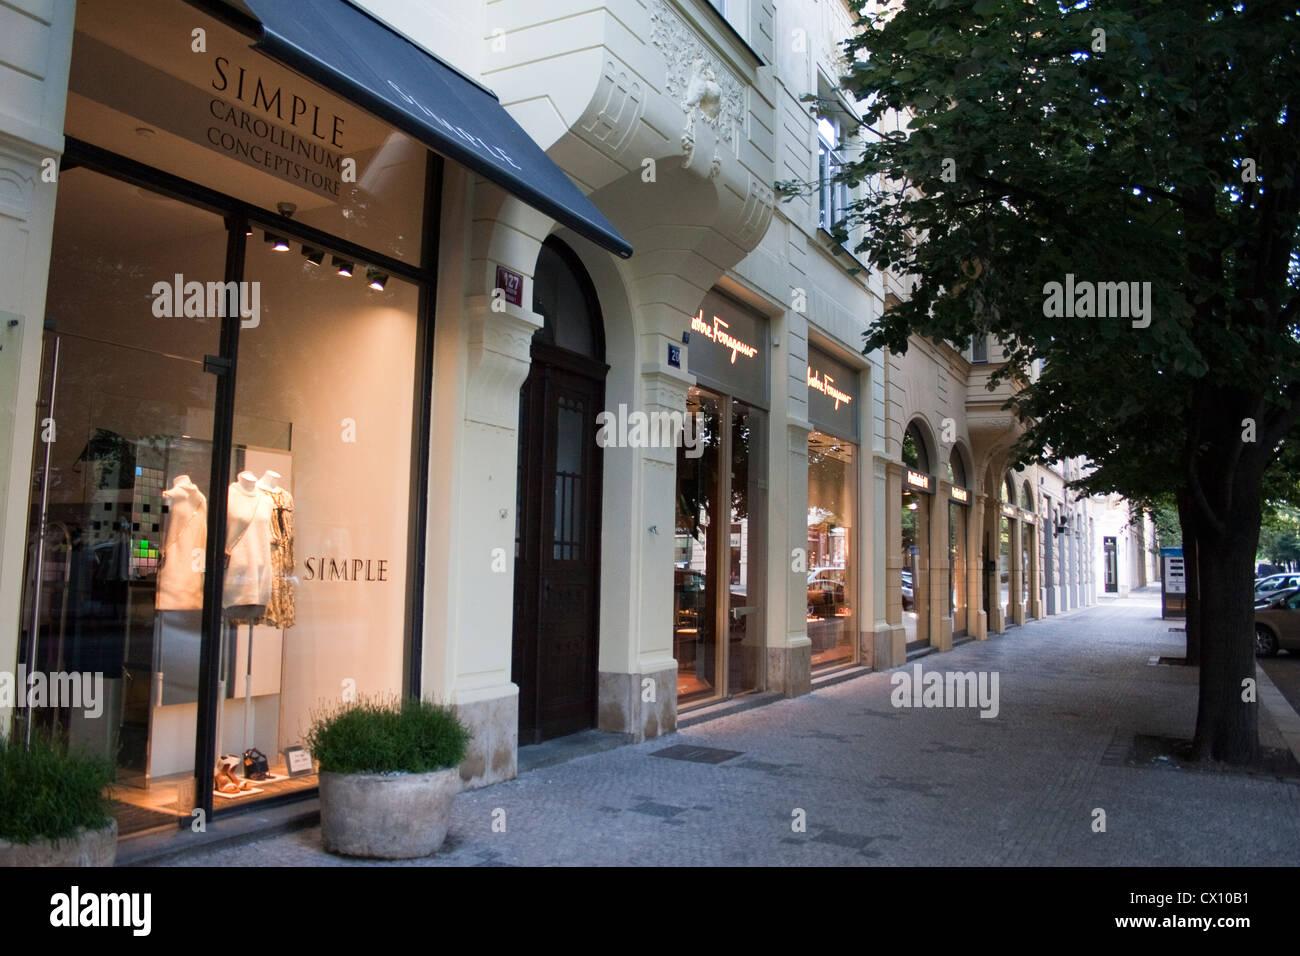 Simple Carollinum Salvatore Ferragamo stores in Parizska Street in Prague Czech Republic on May 23 2012 Parizska - Stock Image